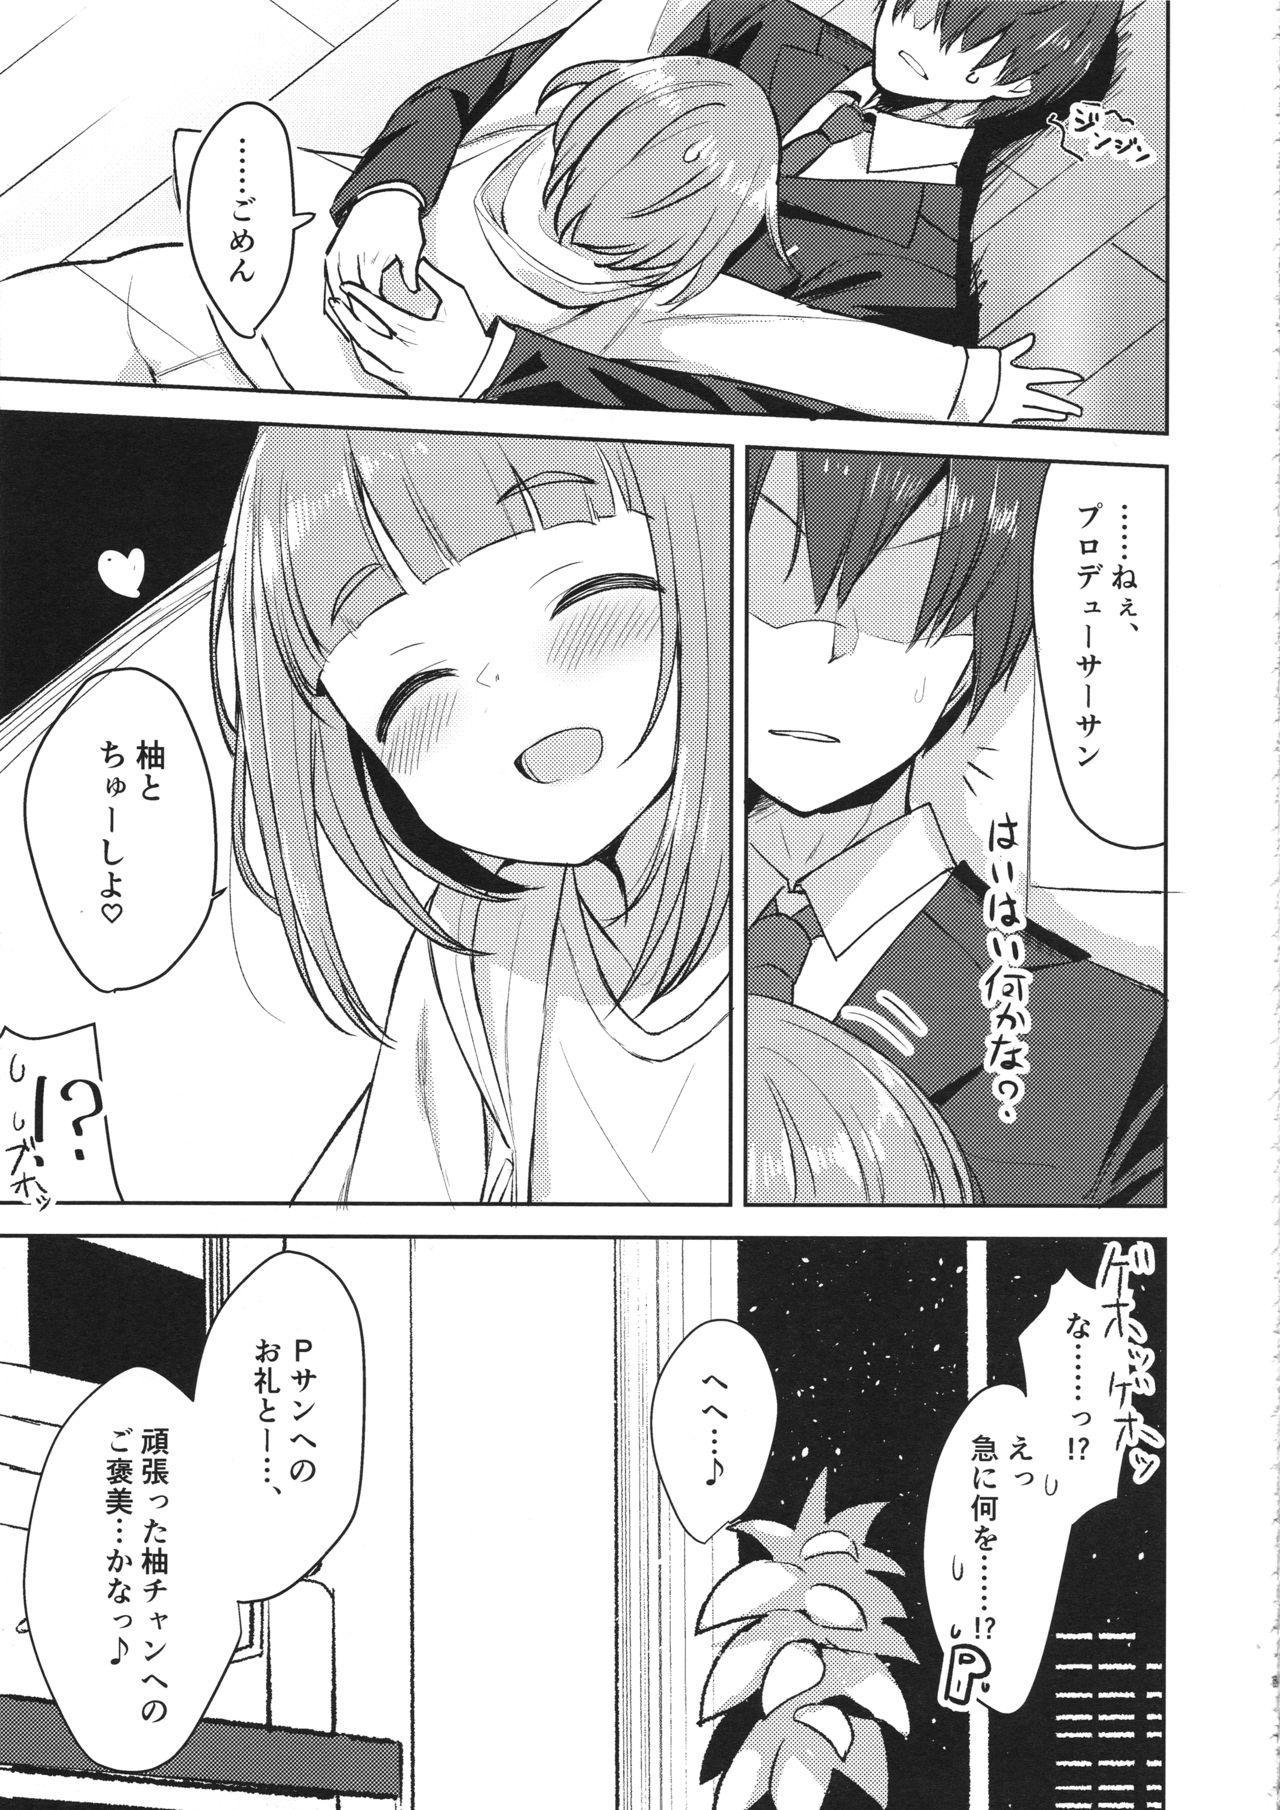 Yuzu no Ecchi na Hon 5